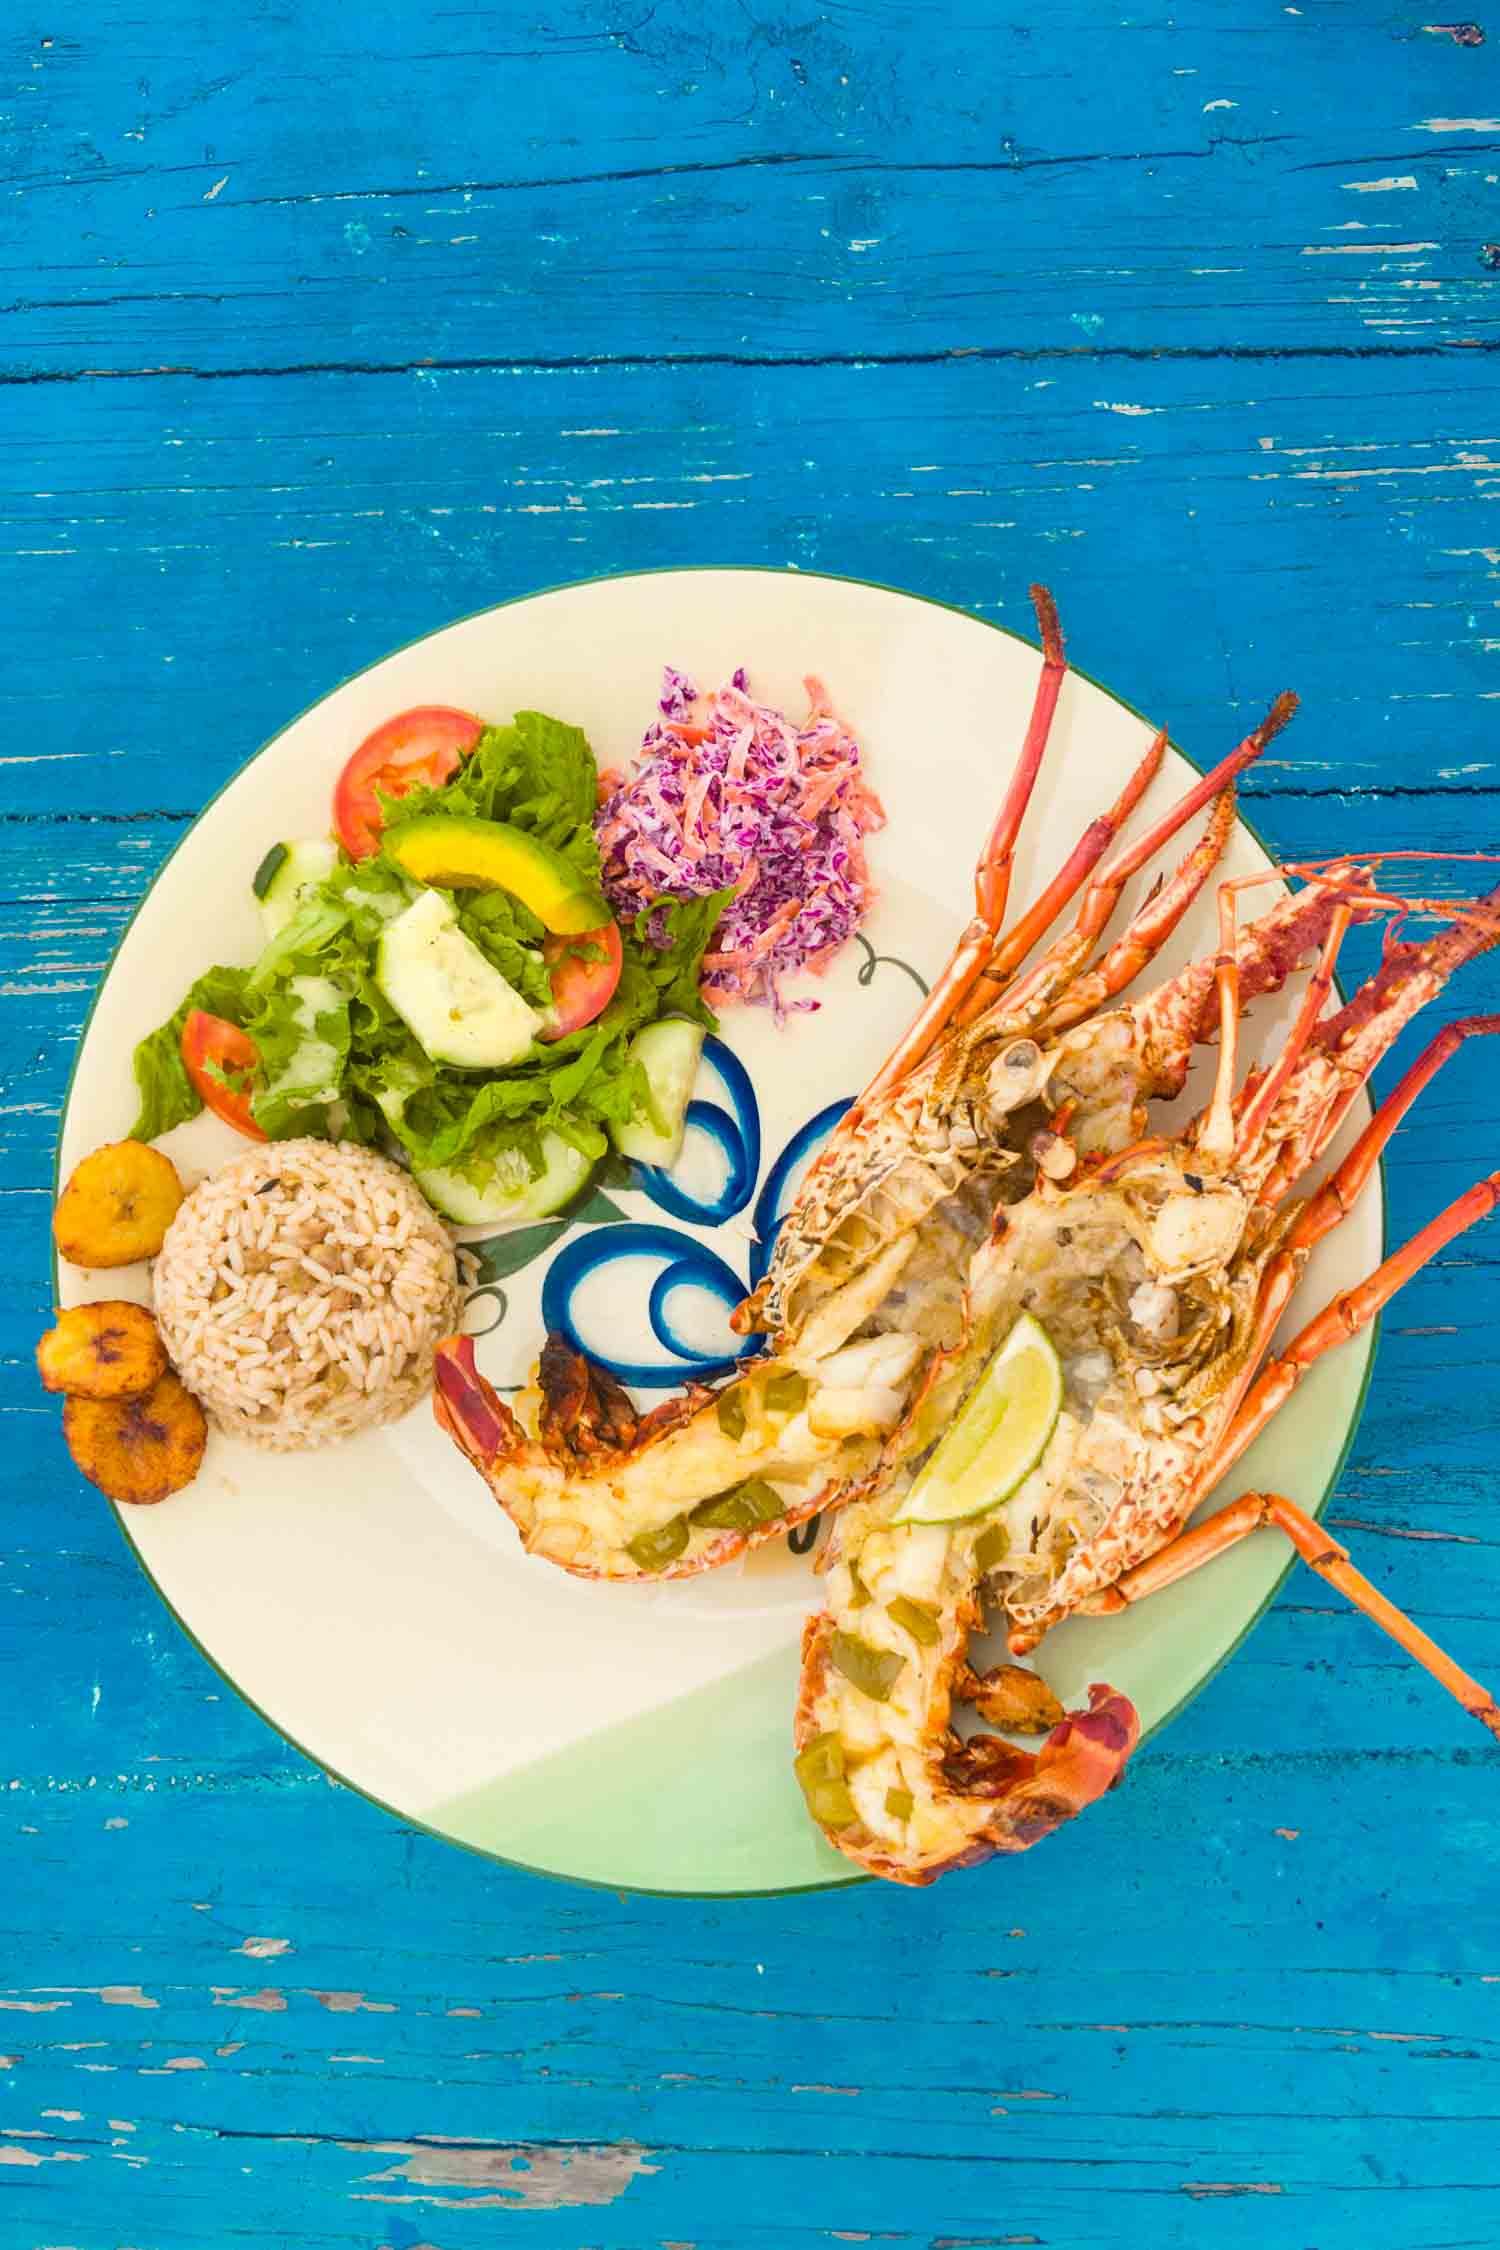 Caribbean lobster dinner in Anguilla.